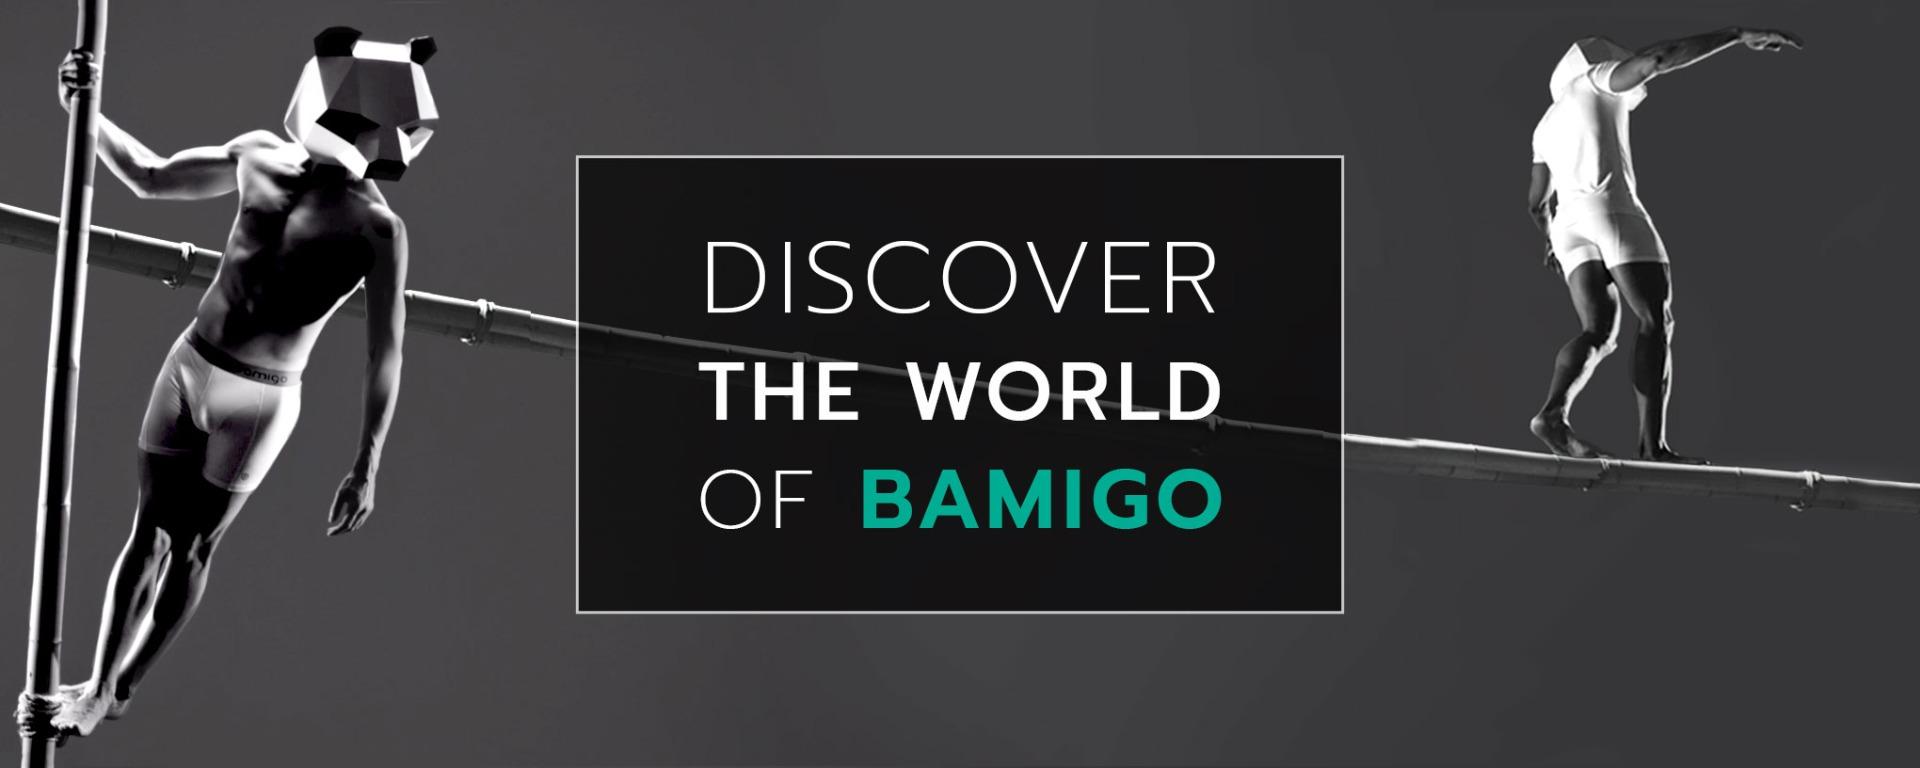 Bamigo's bamboo underwear helps keep Brits cool